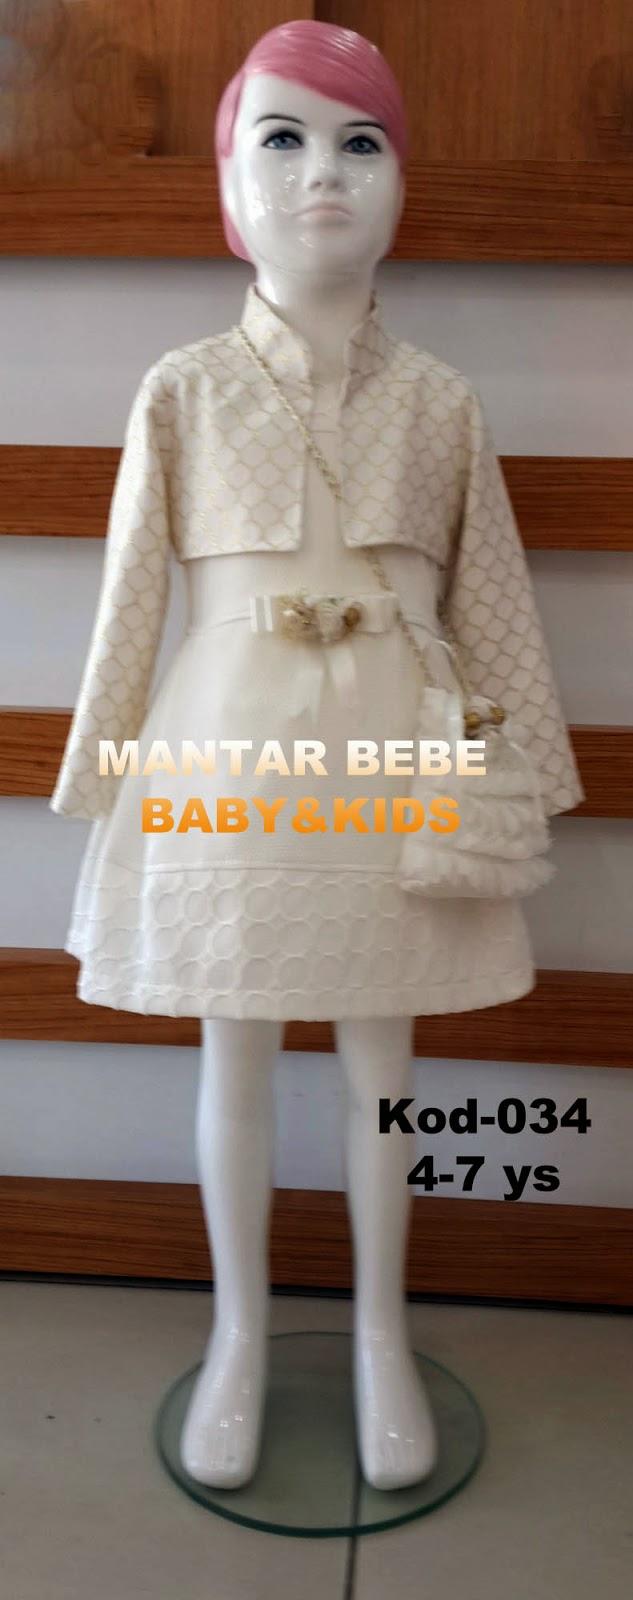 MANTAR BEBE ÇOCUK GİYİM - KOD034